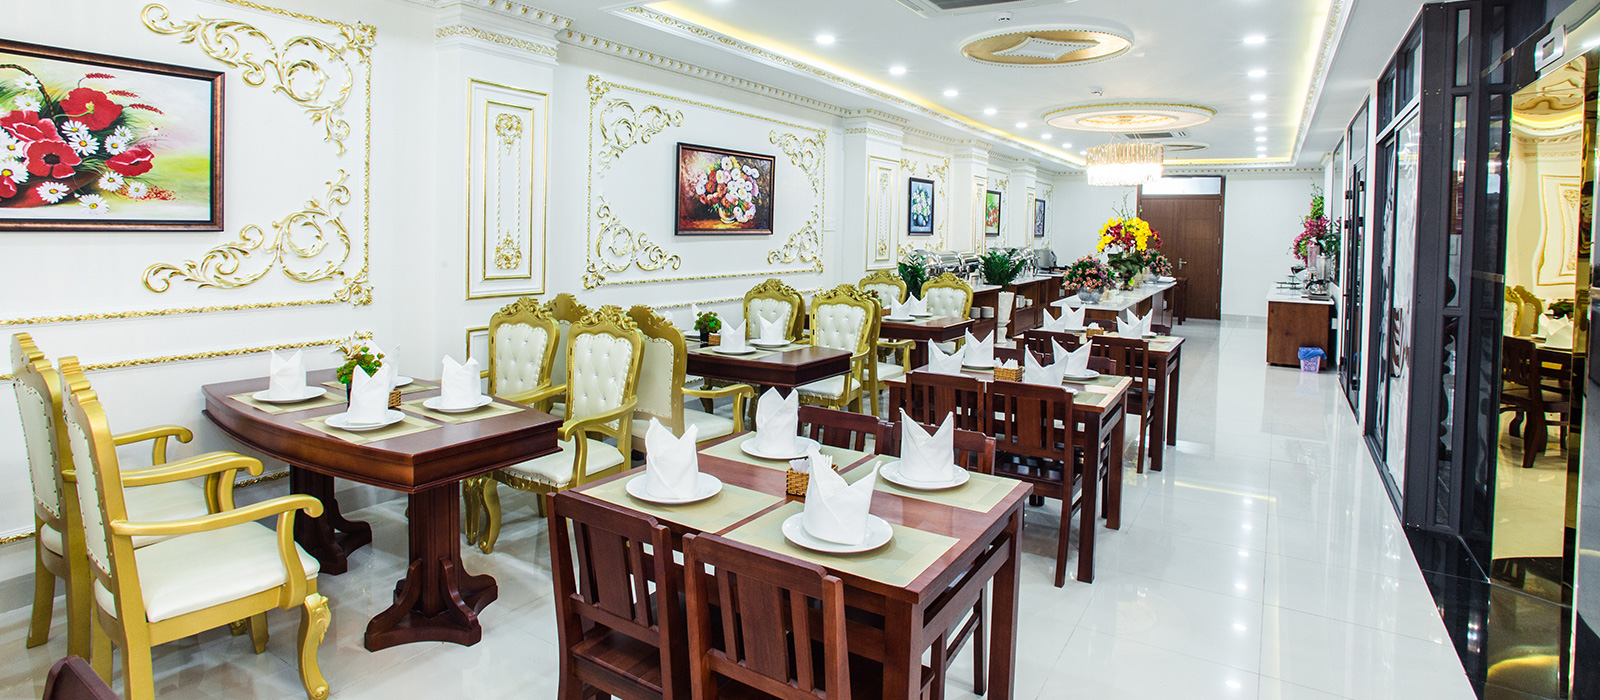 banner-anhthao-hotel-3